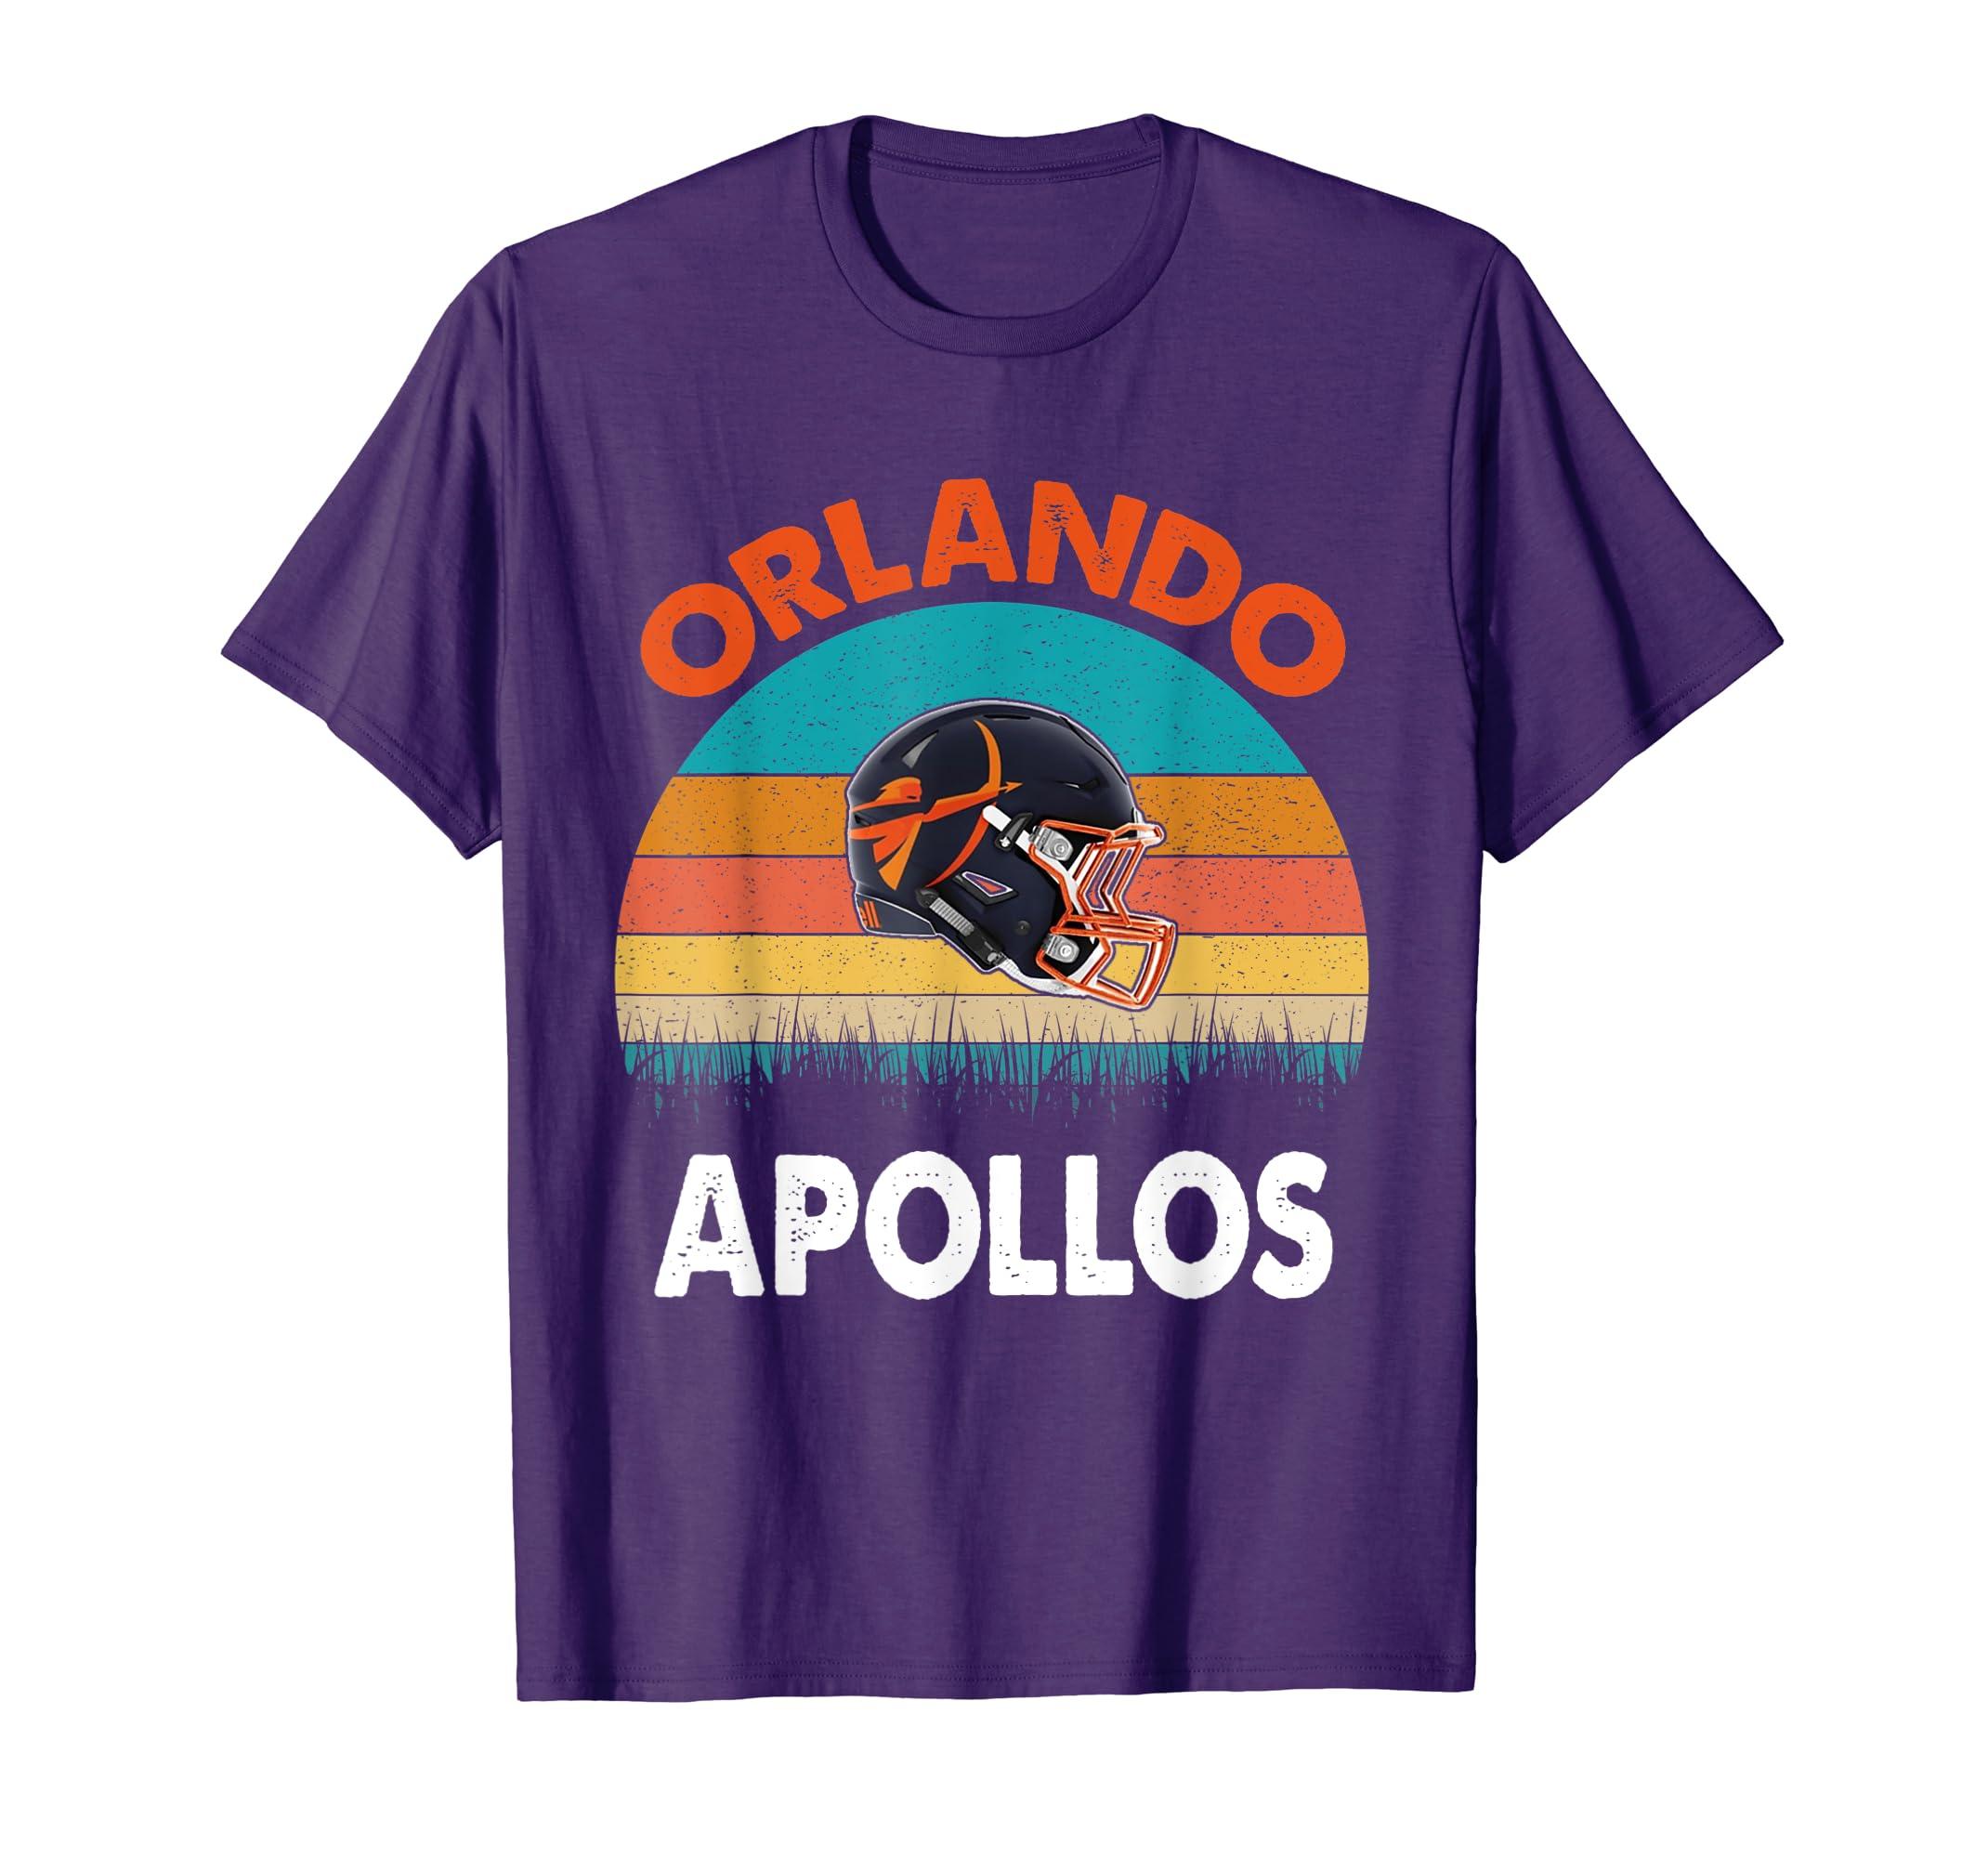 Vintage Orlando Football Apollos T-Shirt For Fans club-Teehay